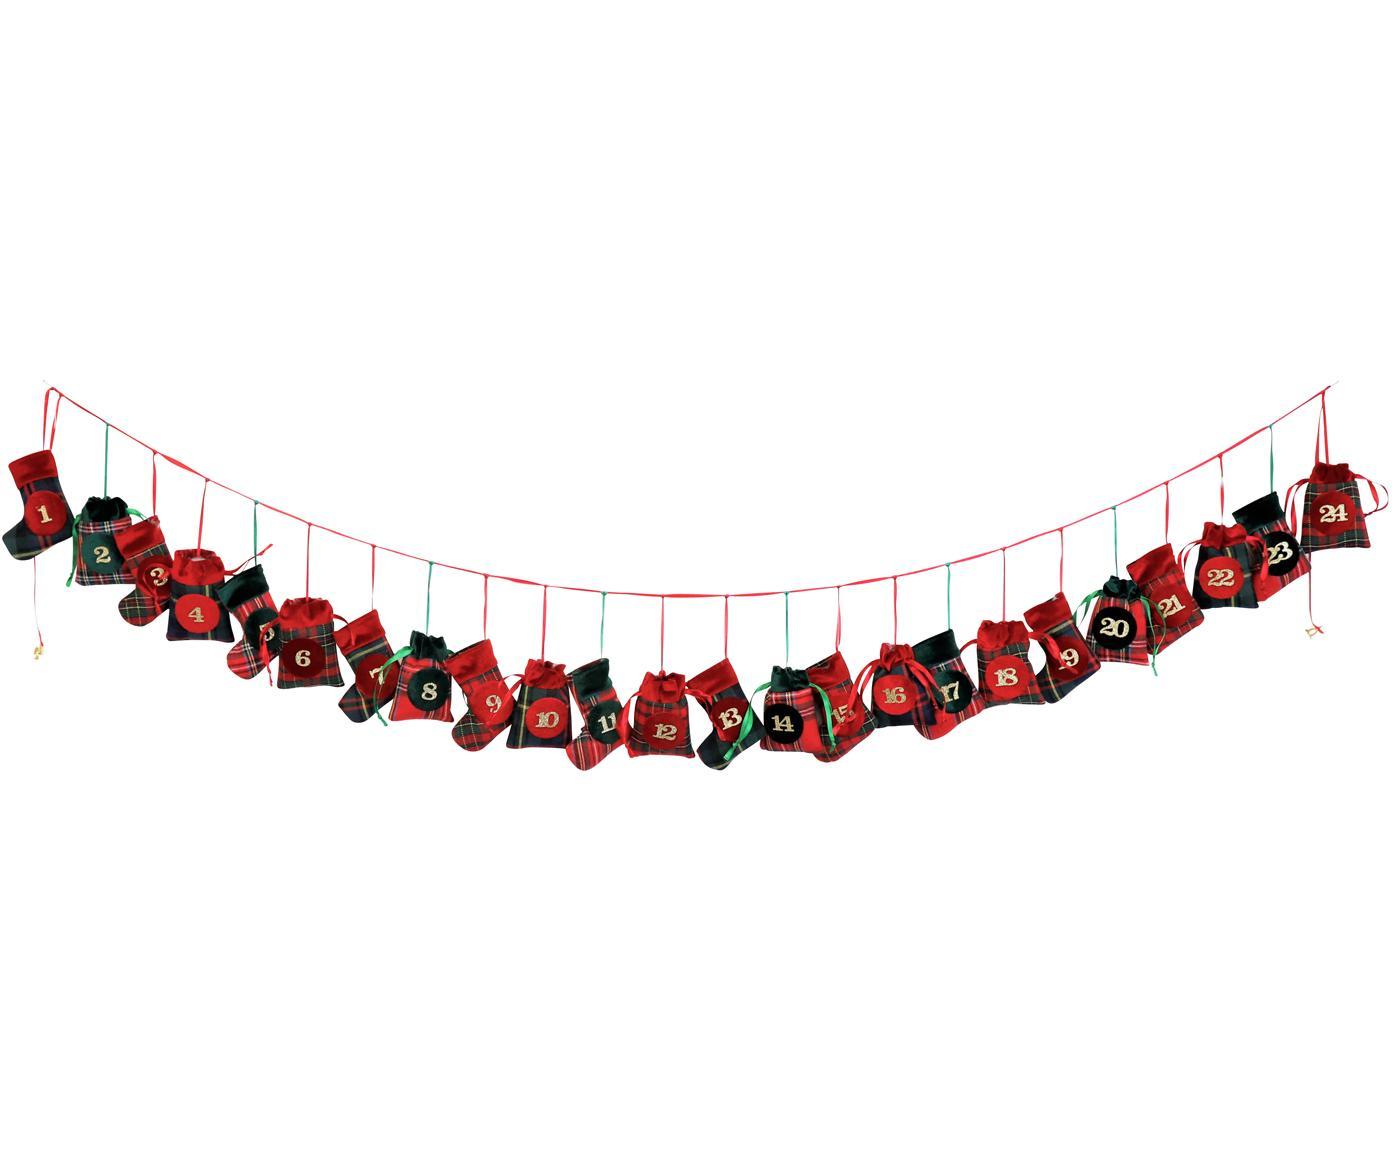 Adventskalender Merry X-Mas , Polyester, katoen, Groen, rood, zwart, L 270 cm